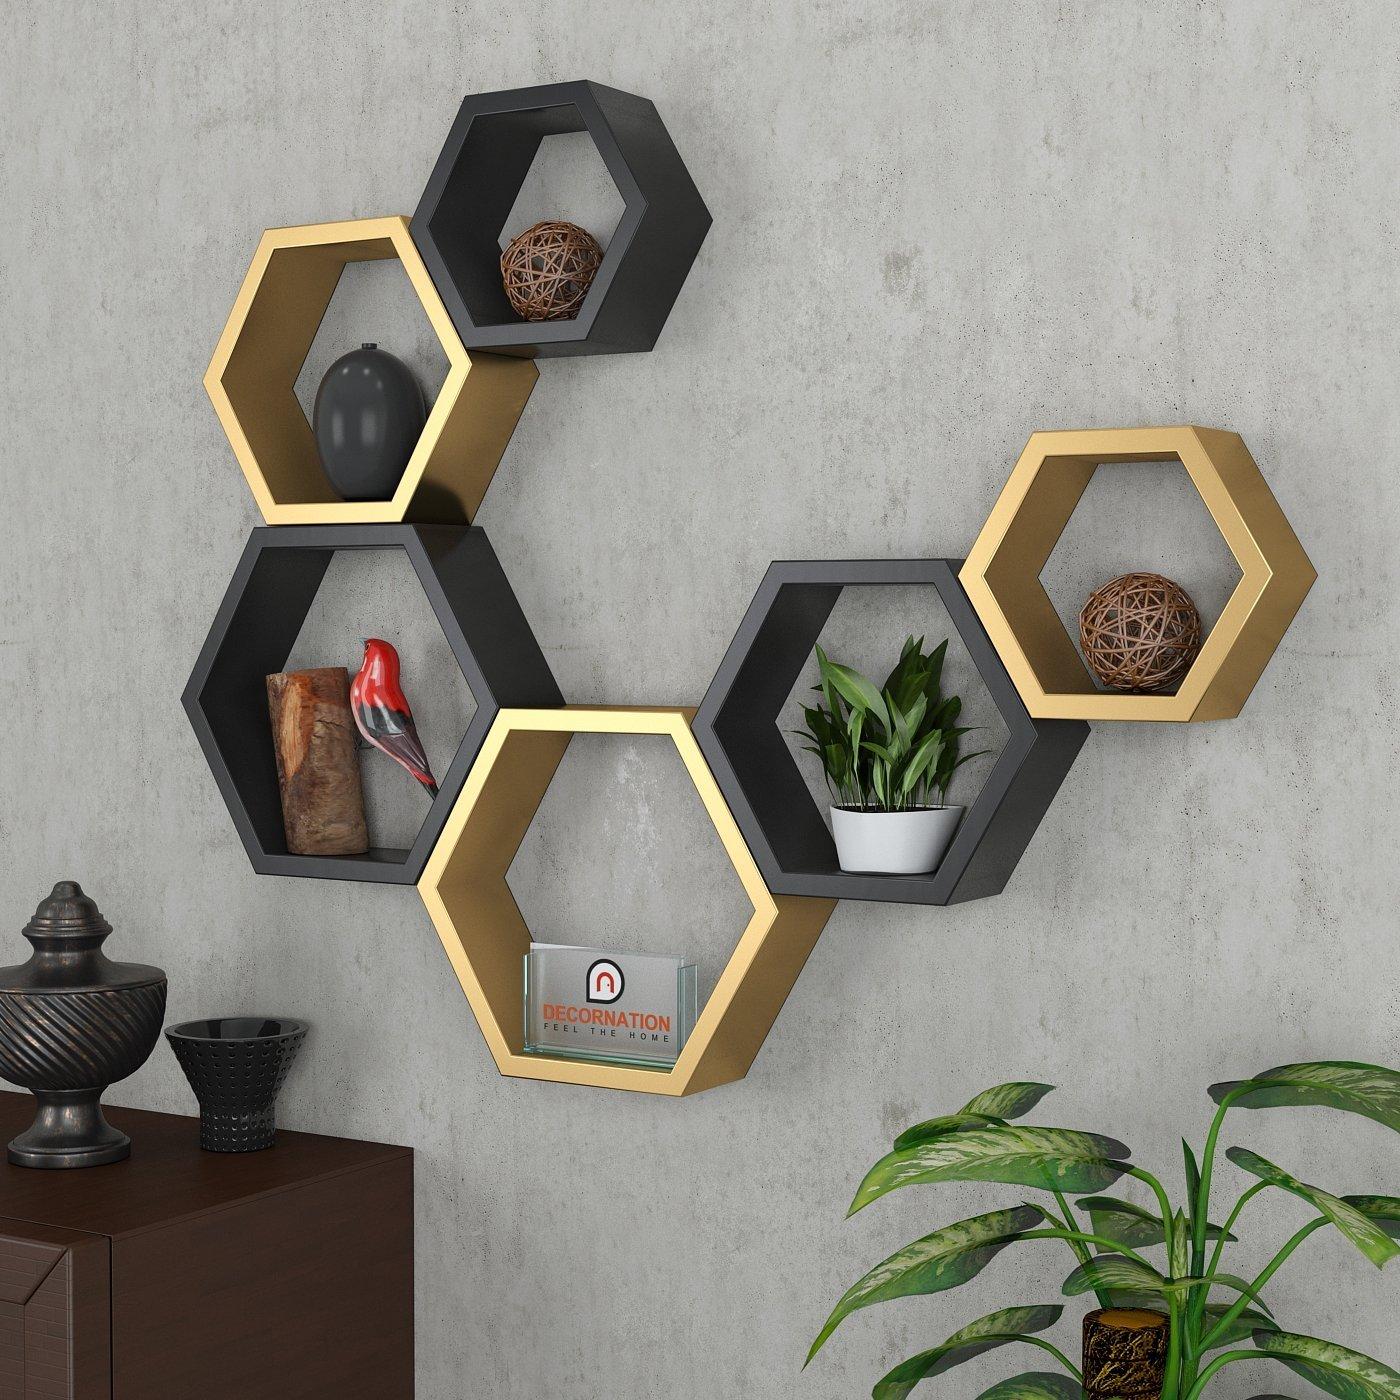 storage shelves in golden black